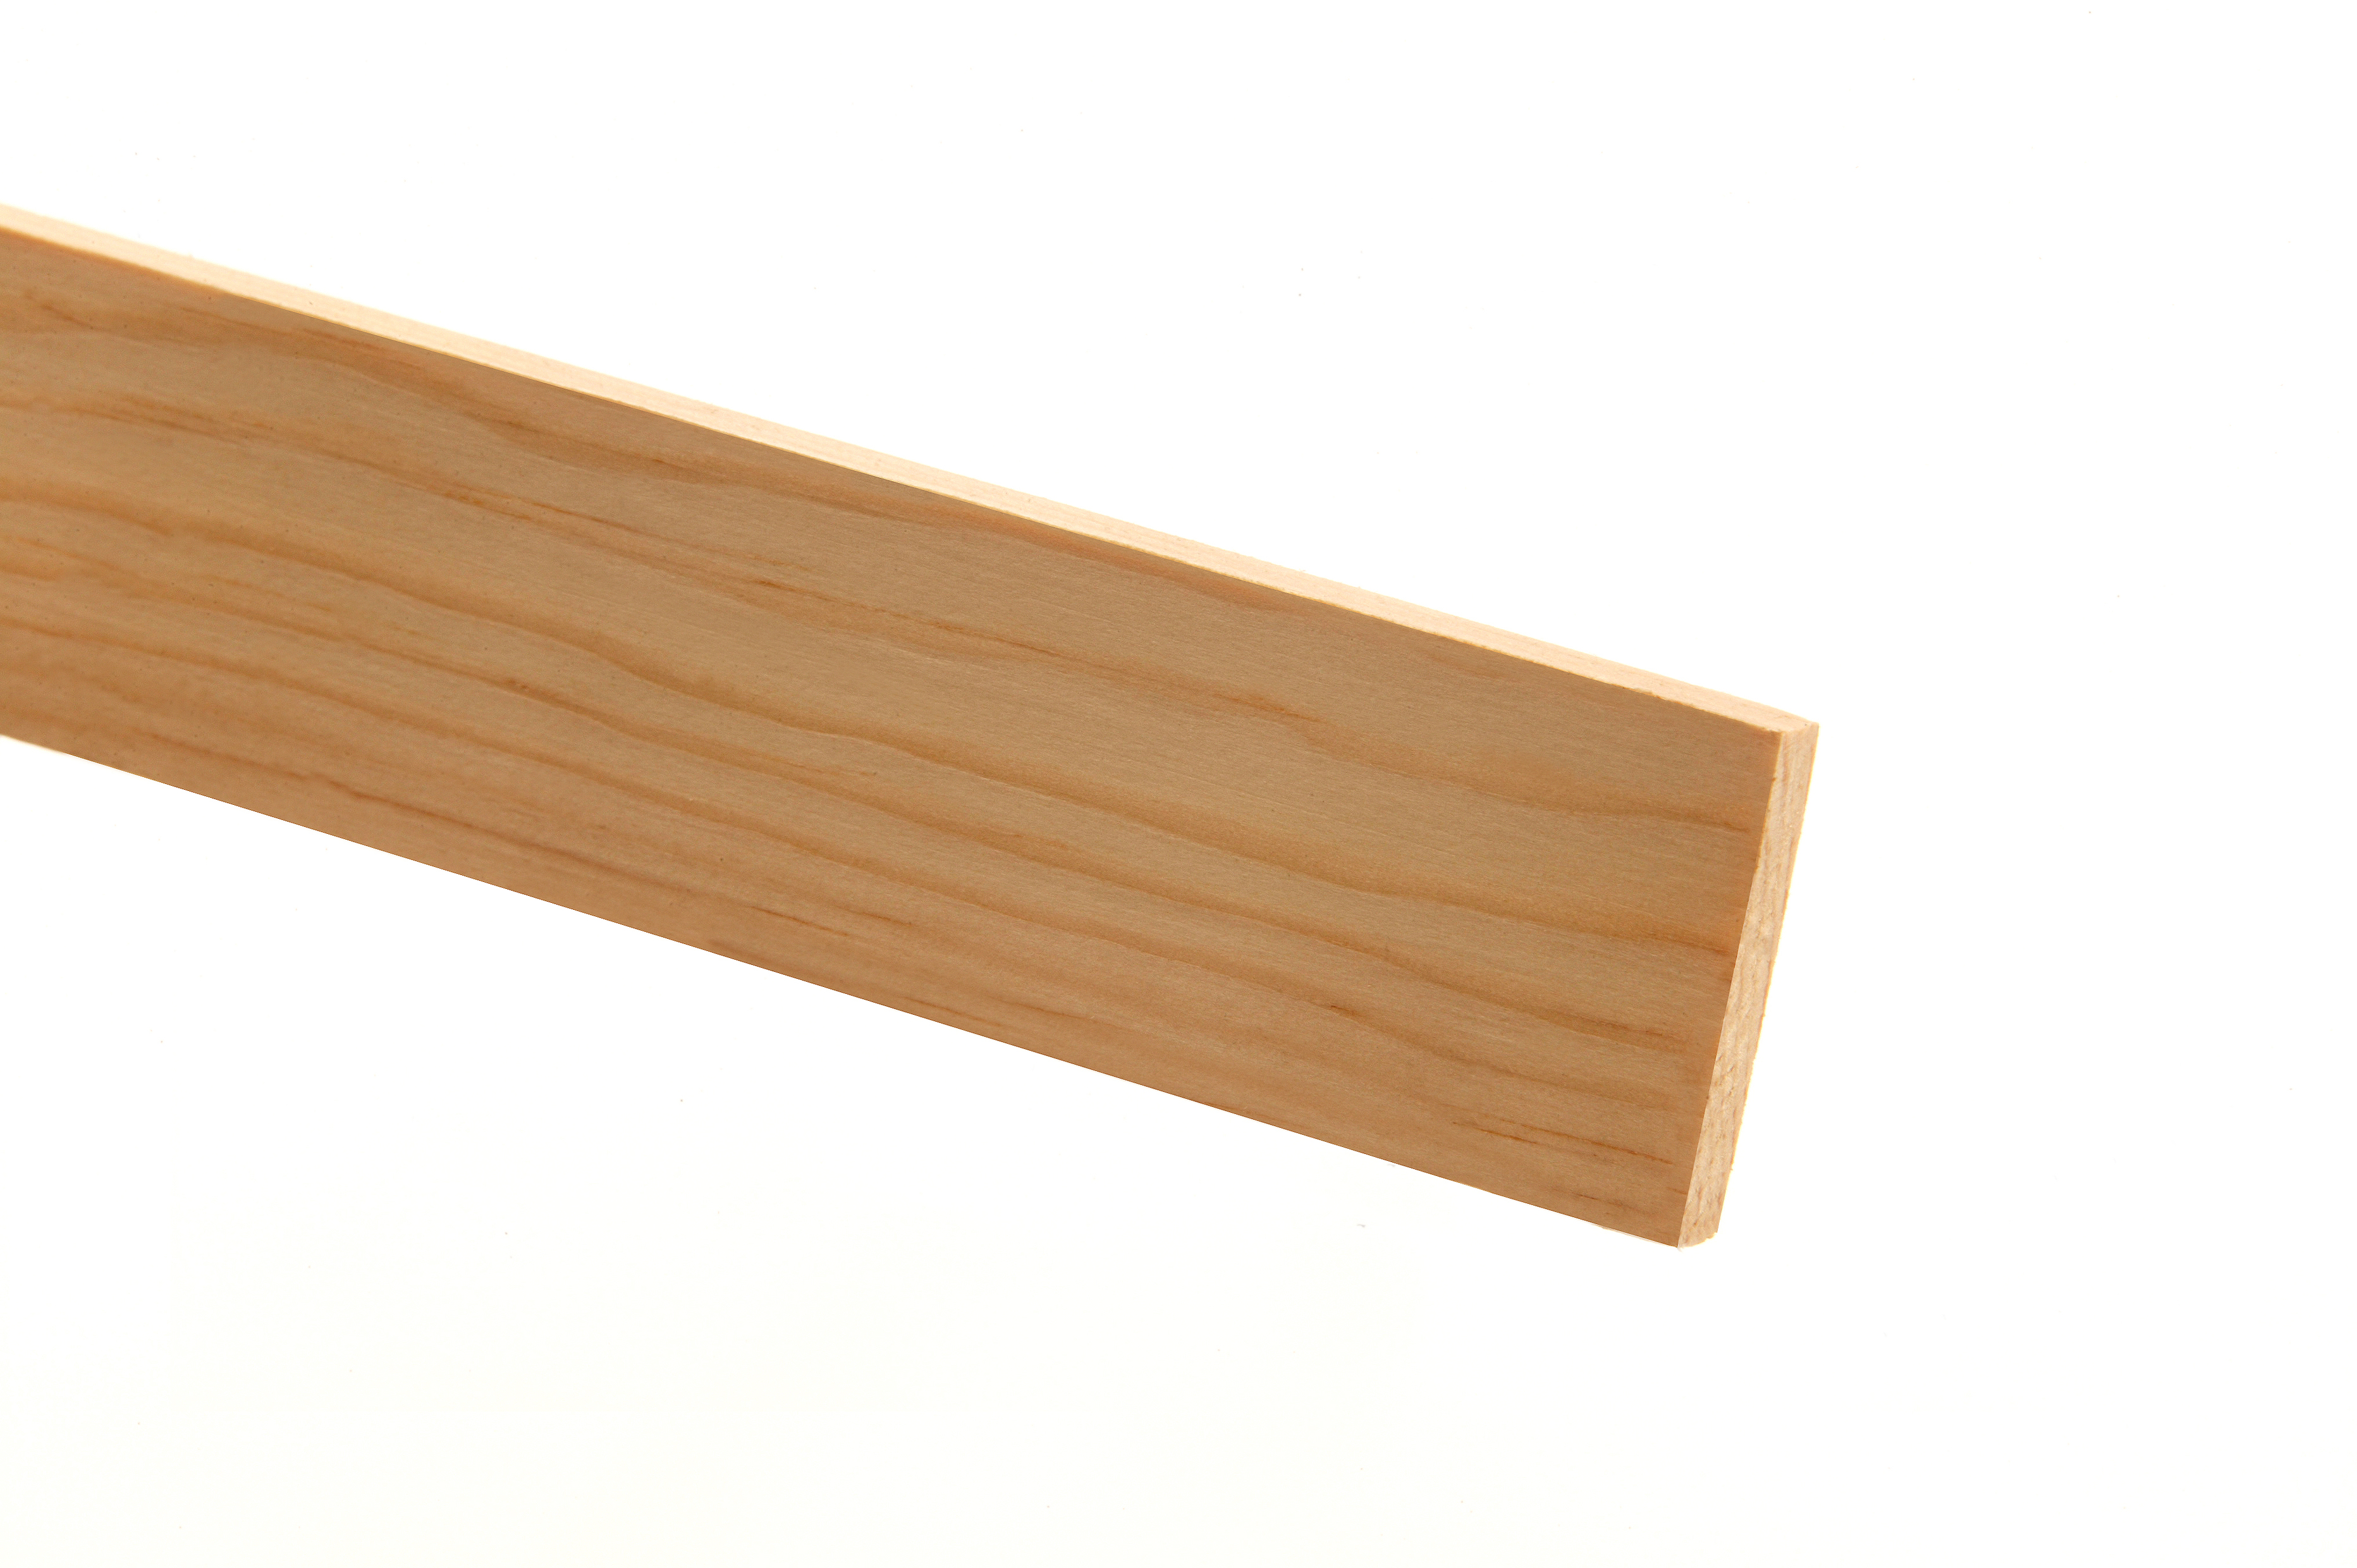 10 Pine PSE Stripwood 12 x 120 x 2400mm